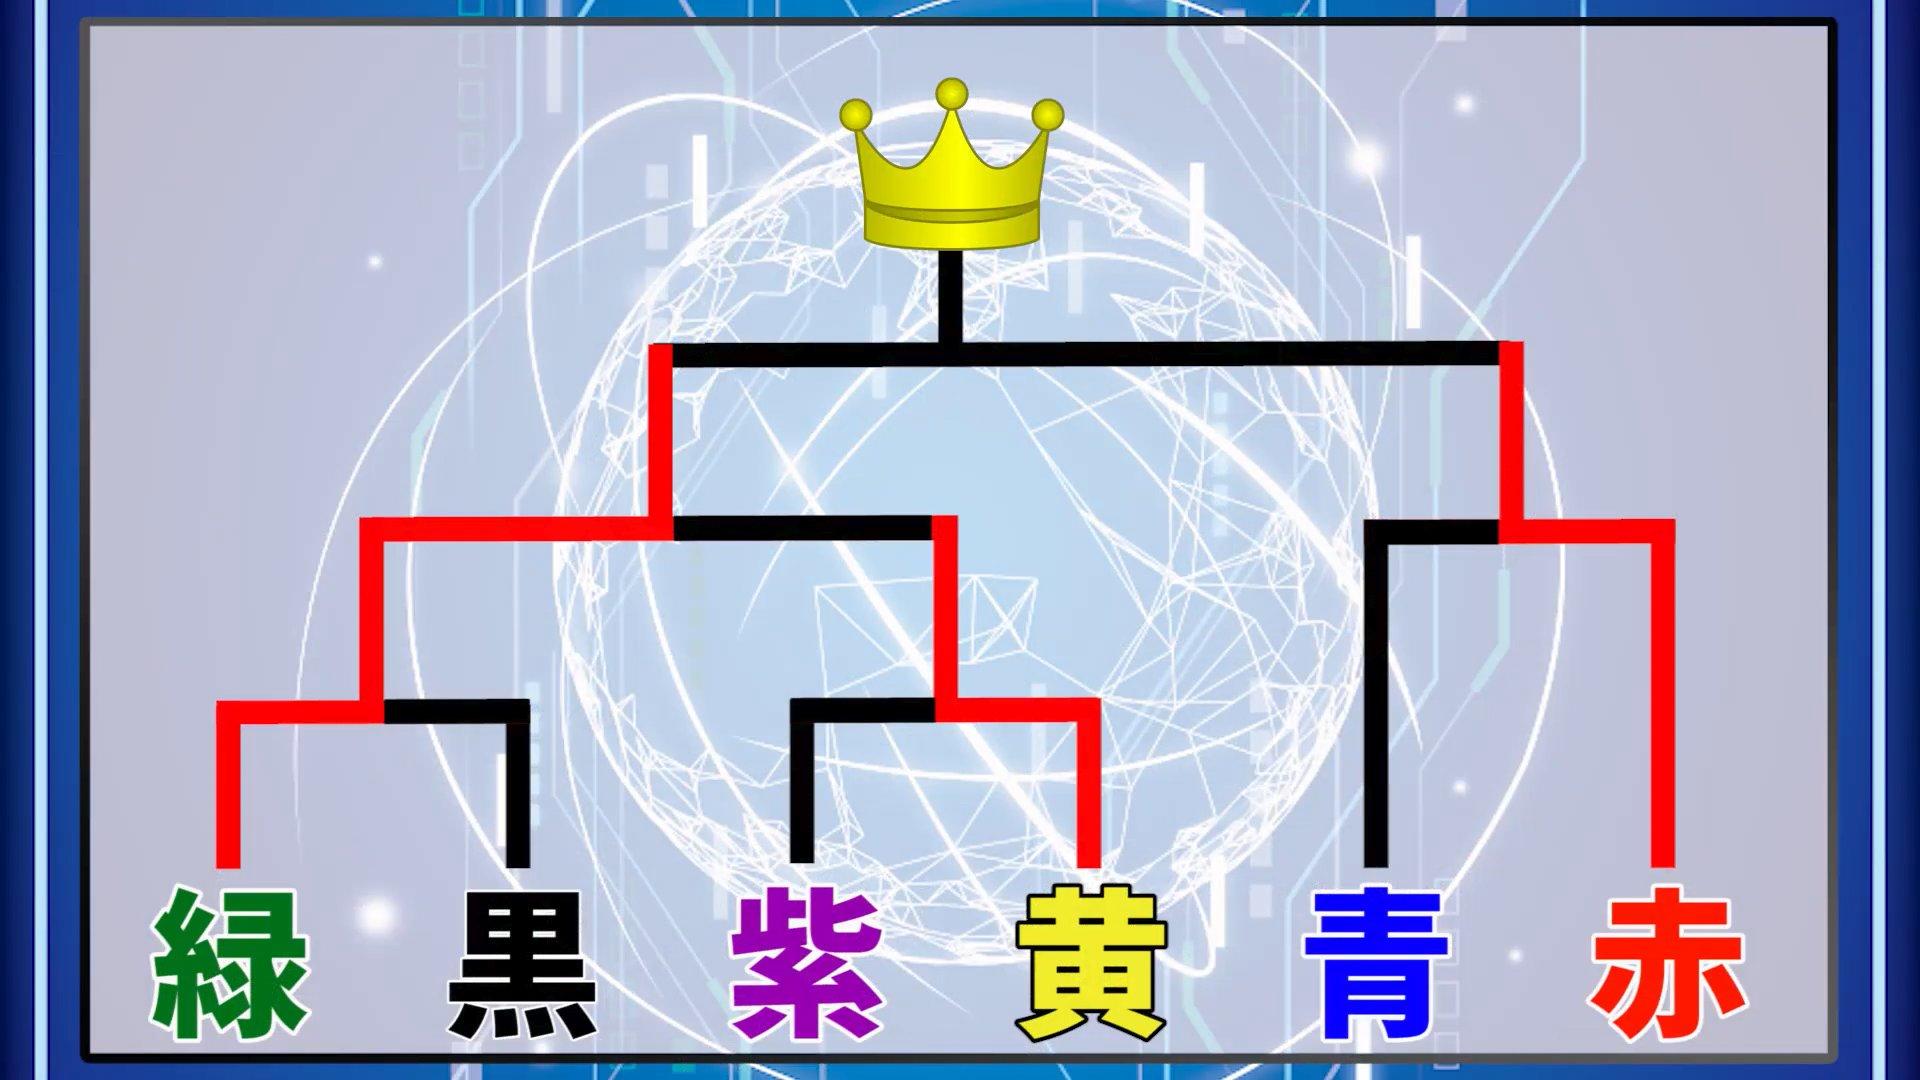 fundigica44_monochromefinals_september28_2020.jpg